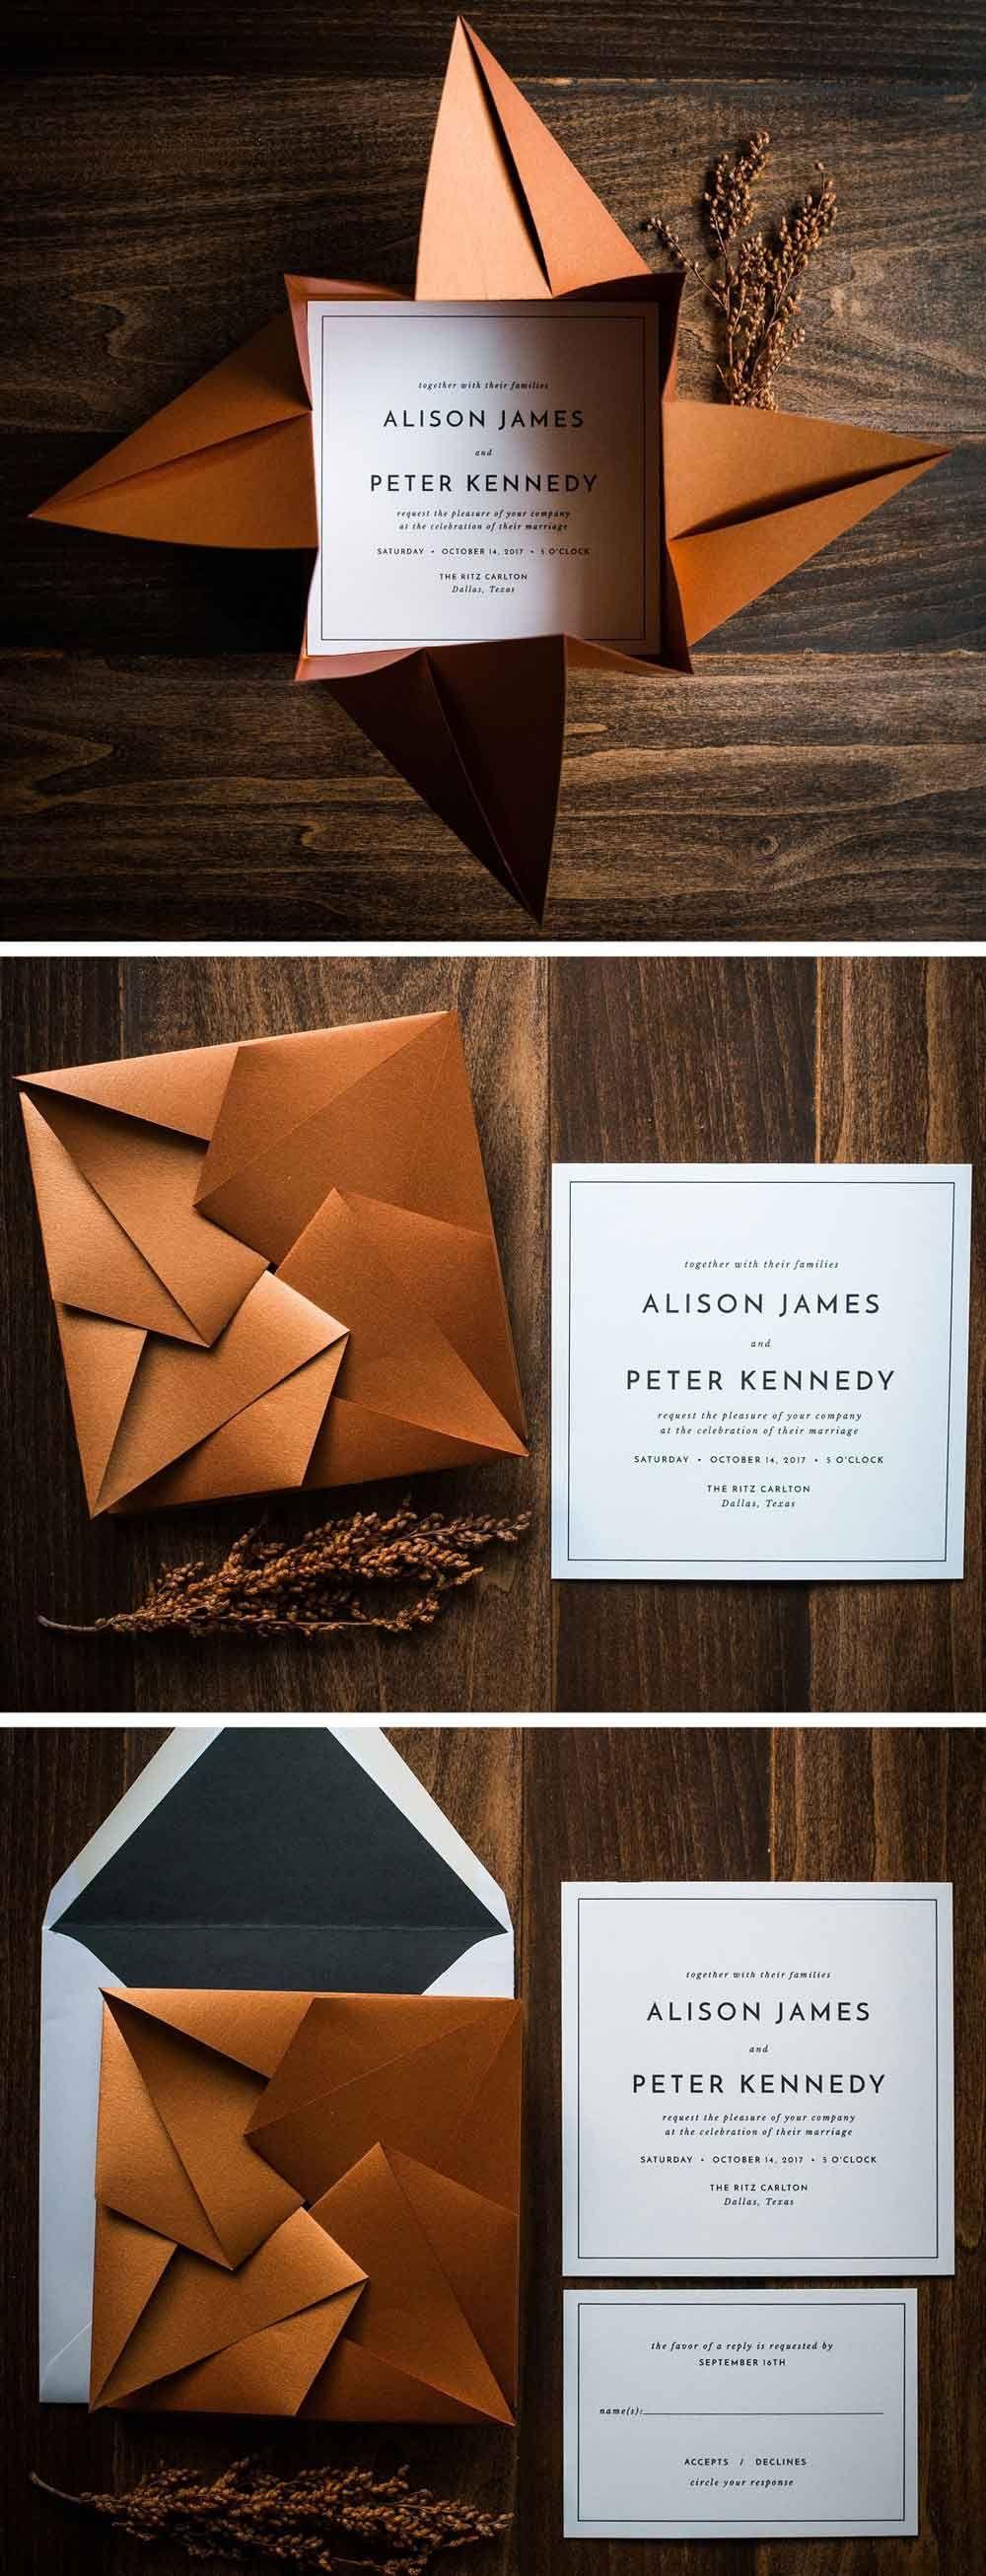 10 Creative And Gorgeous Diy Wedding Invitation Ideas Origami Wedding Invitations Trendy Wedding Invitations Fun Wedding Invitations